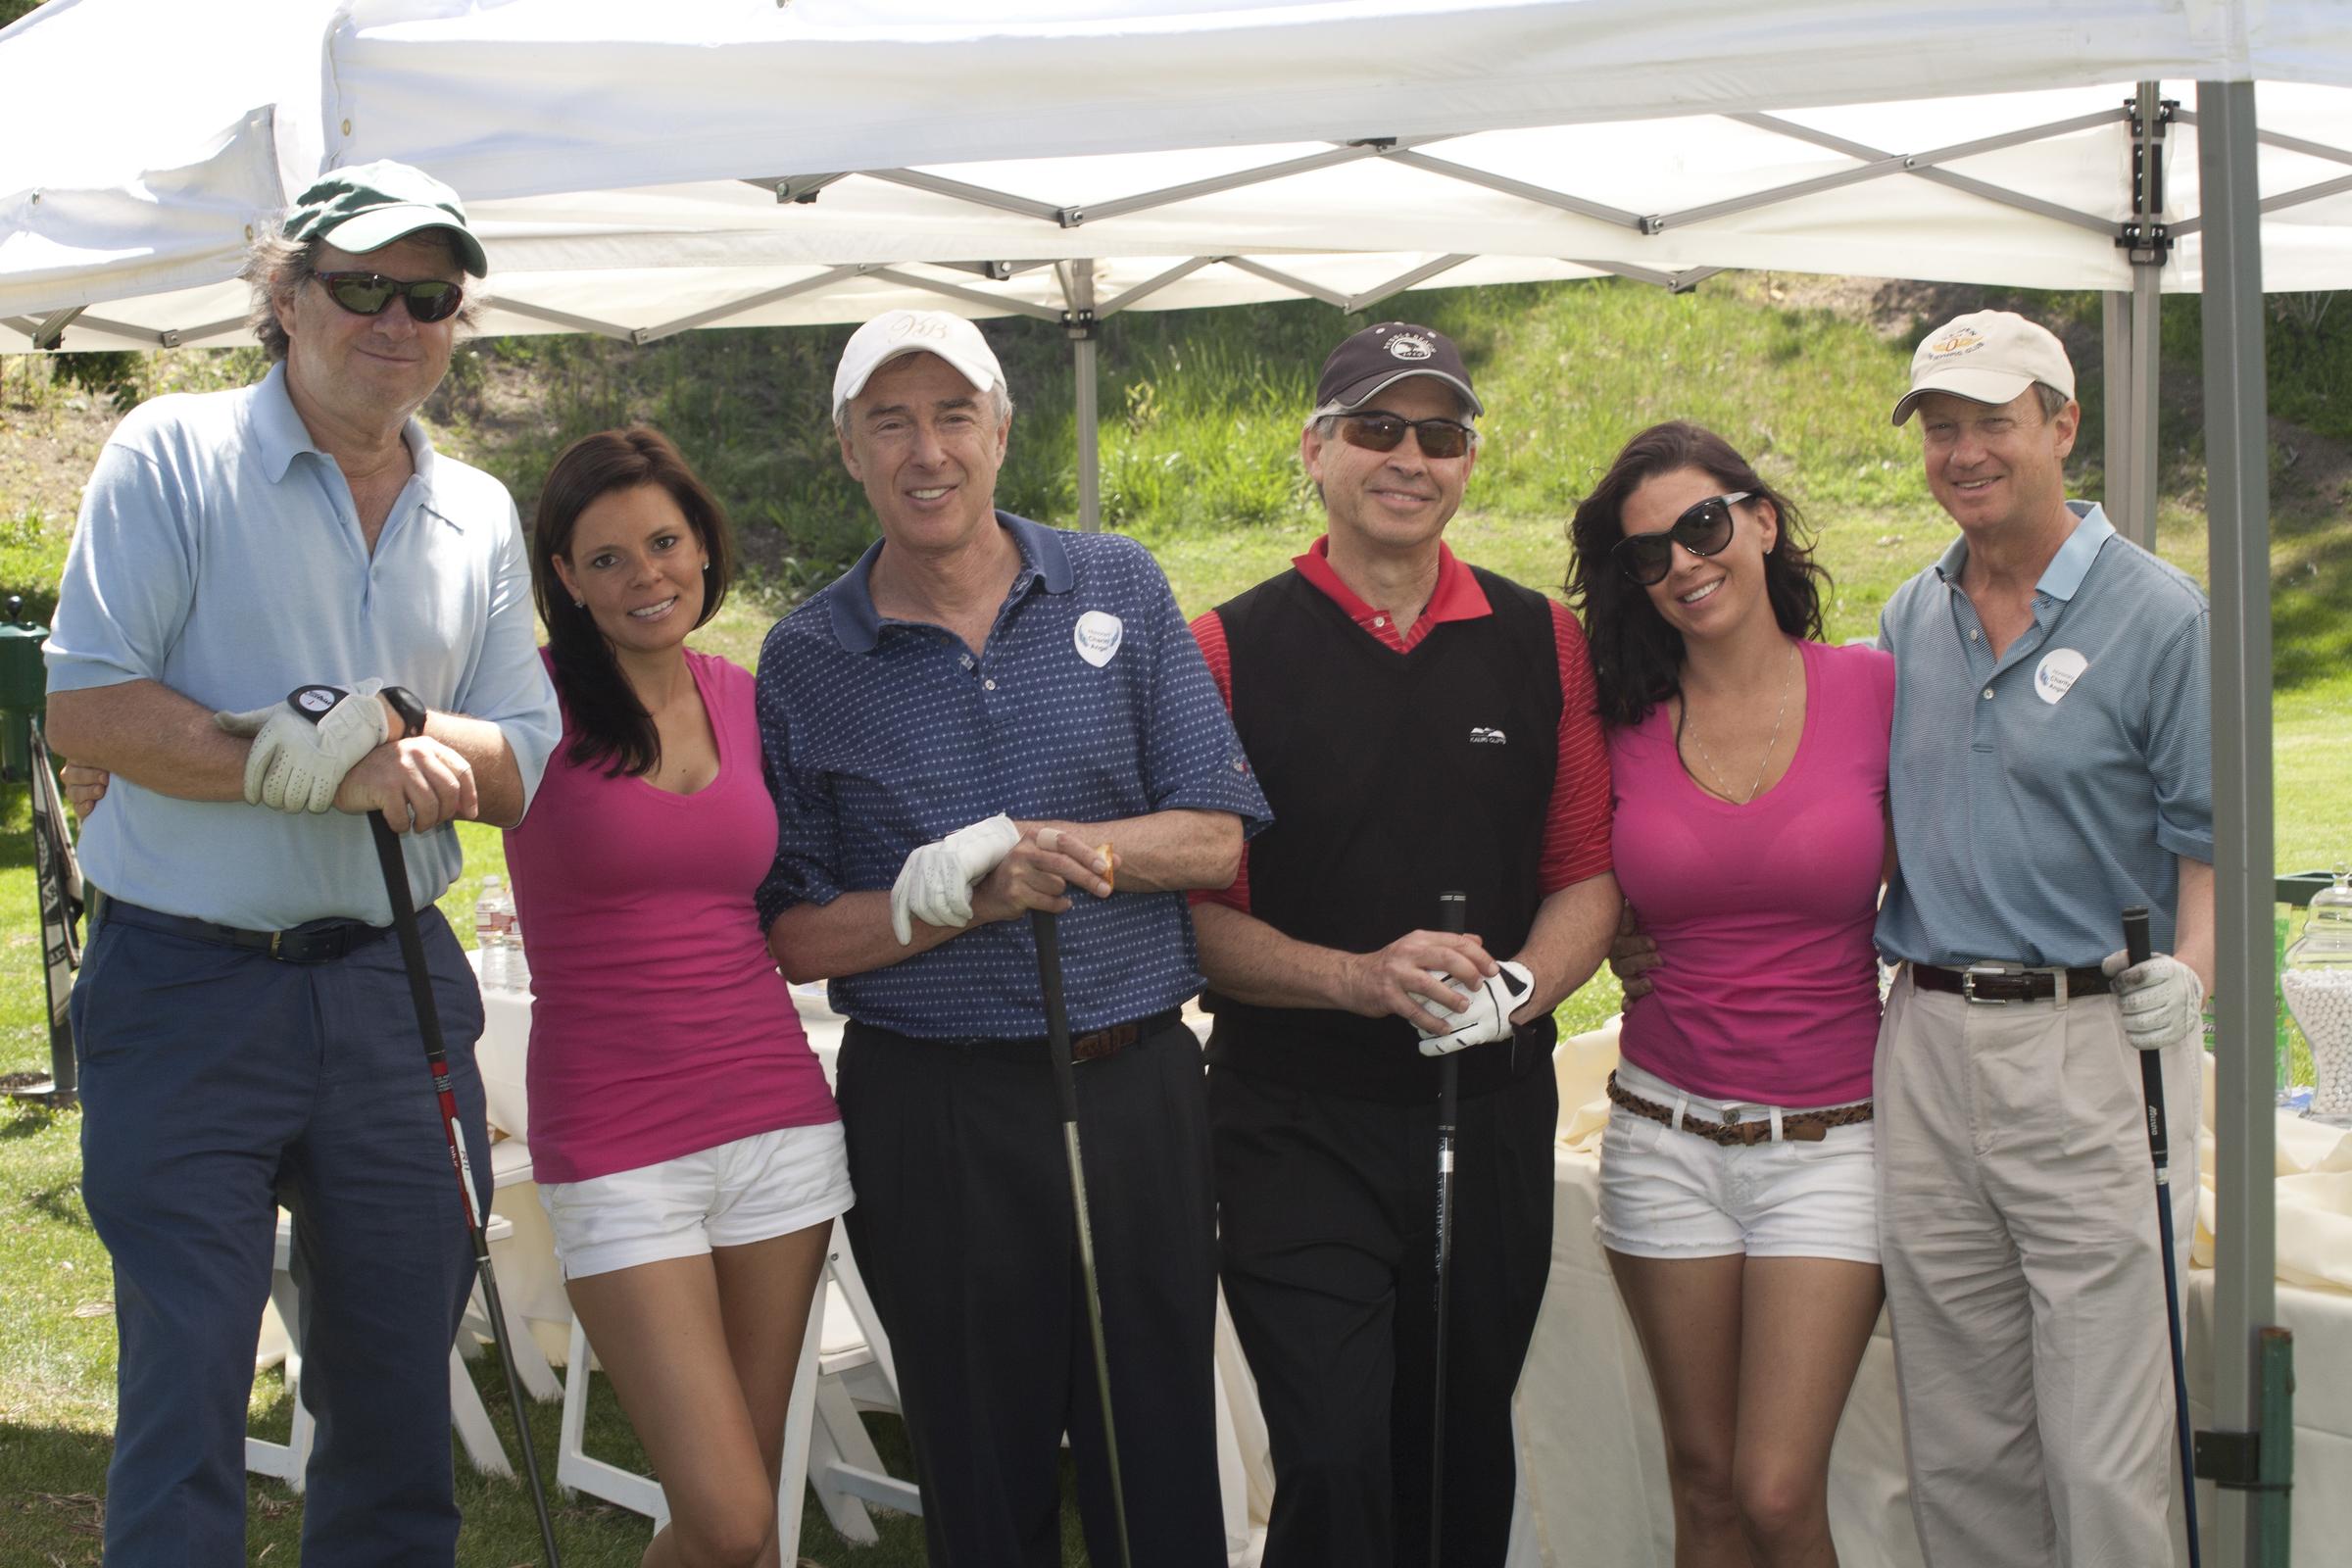 IMG_7573MSM_golf_event.JPG